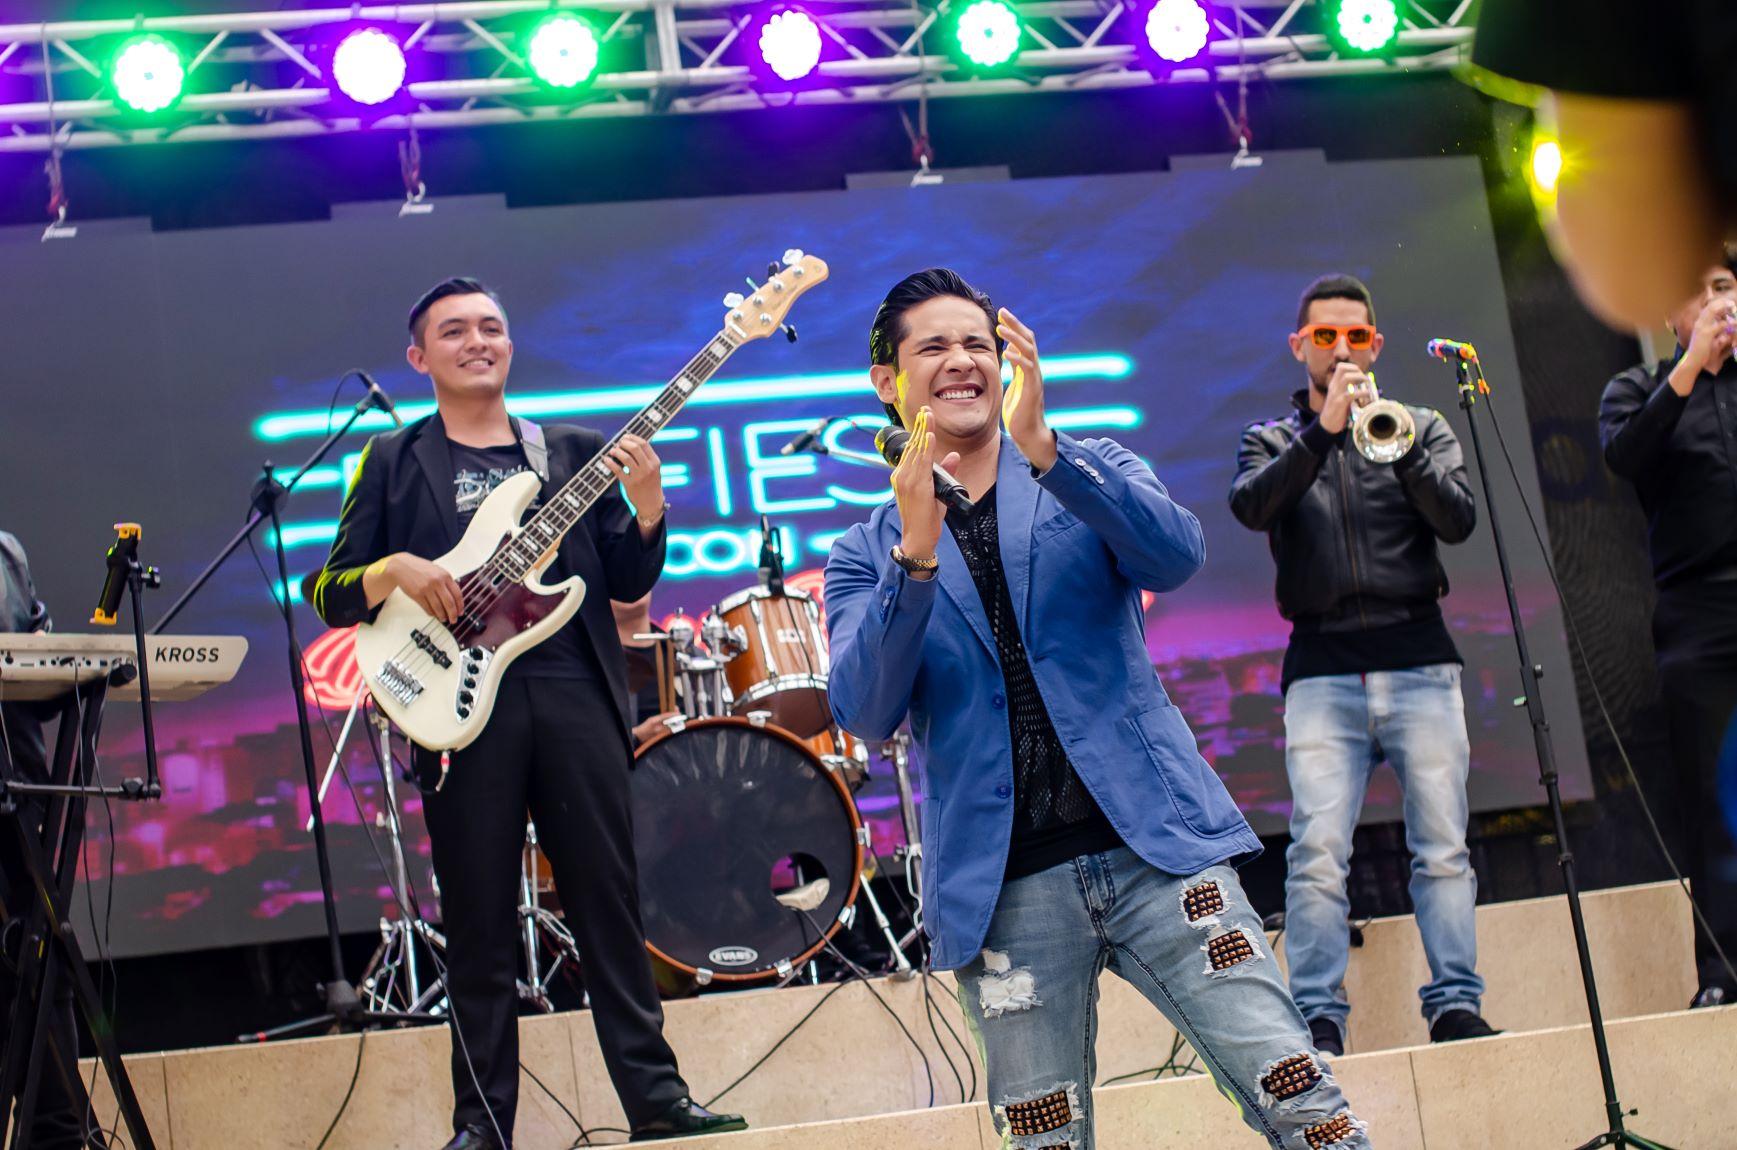 Juan Pablo Navarrete dejó a la mitad una carrera universitaria para dedicarse a la música